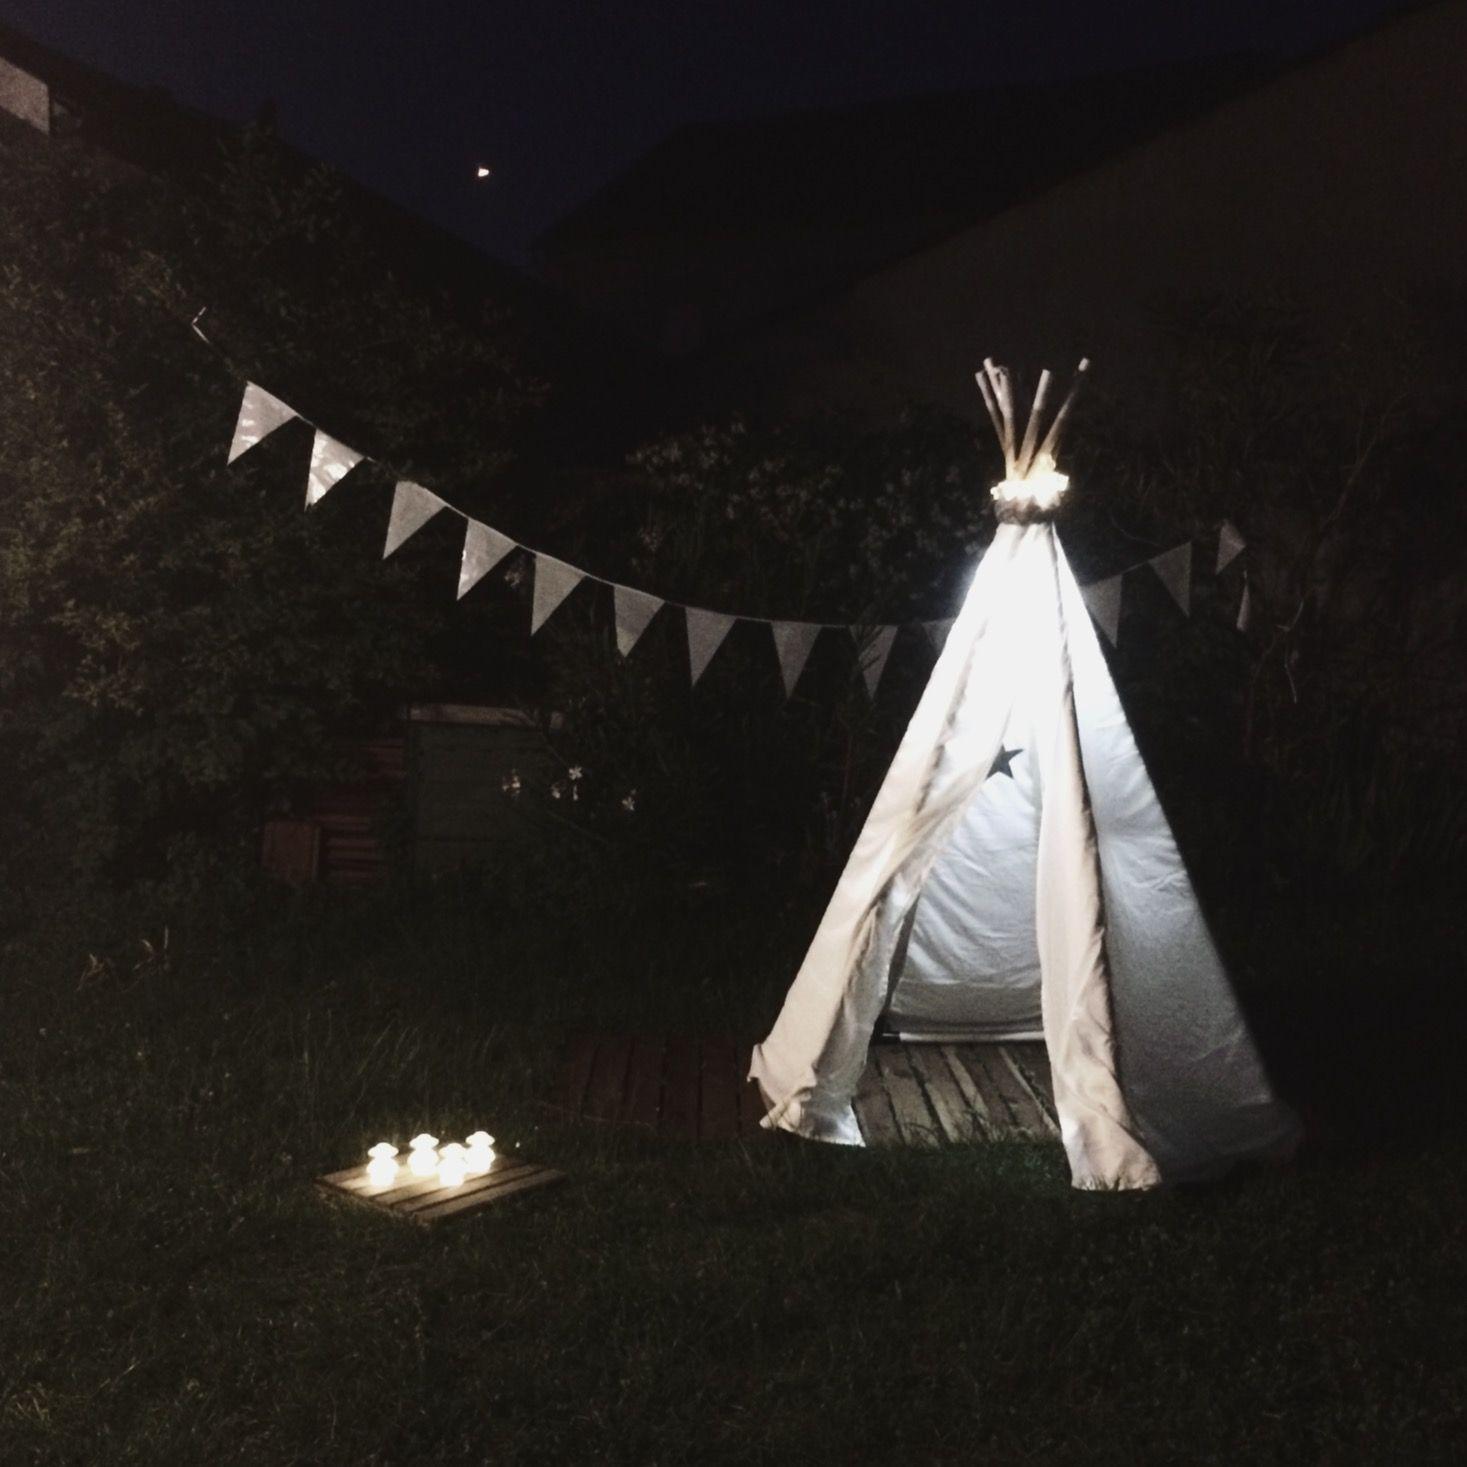 Tipi ampm indien deco jardin nuit leds | Octave amour ...